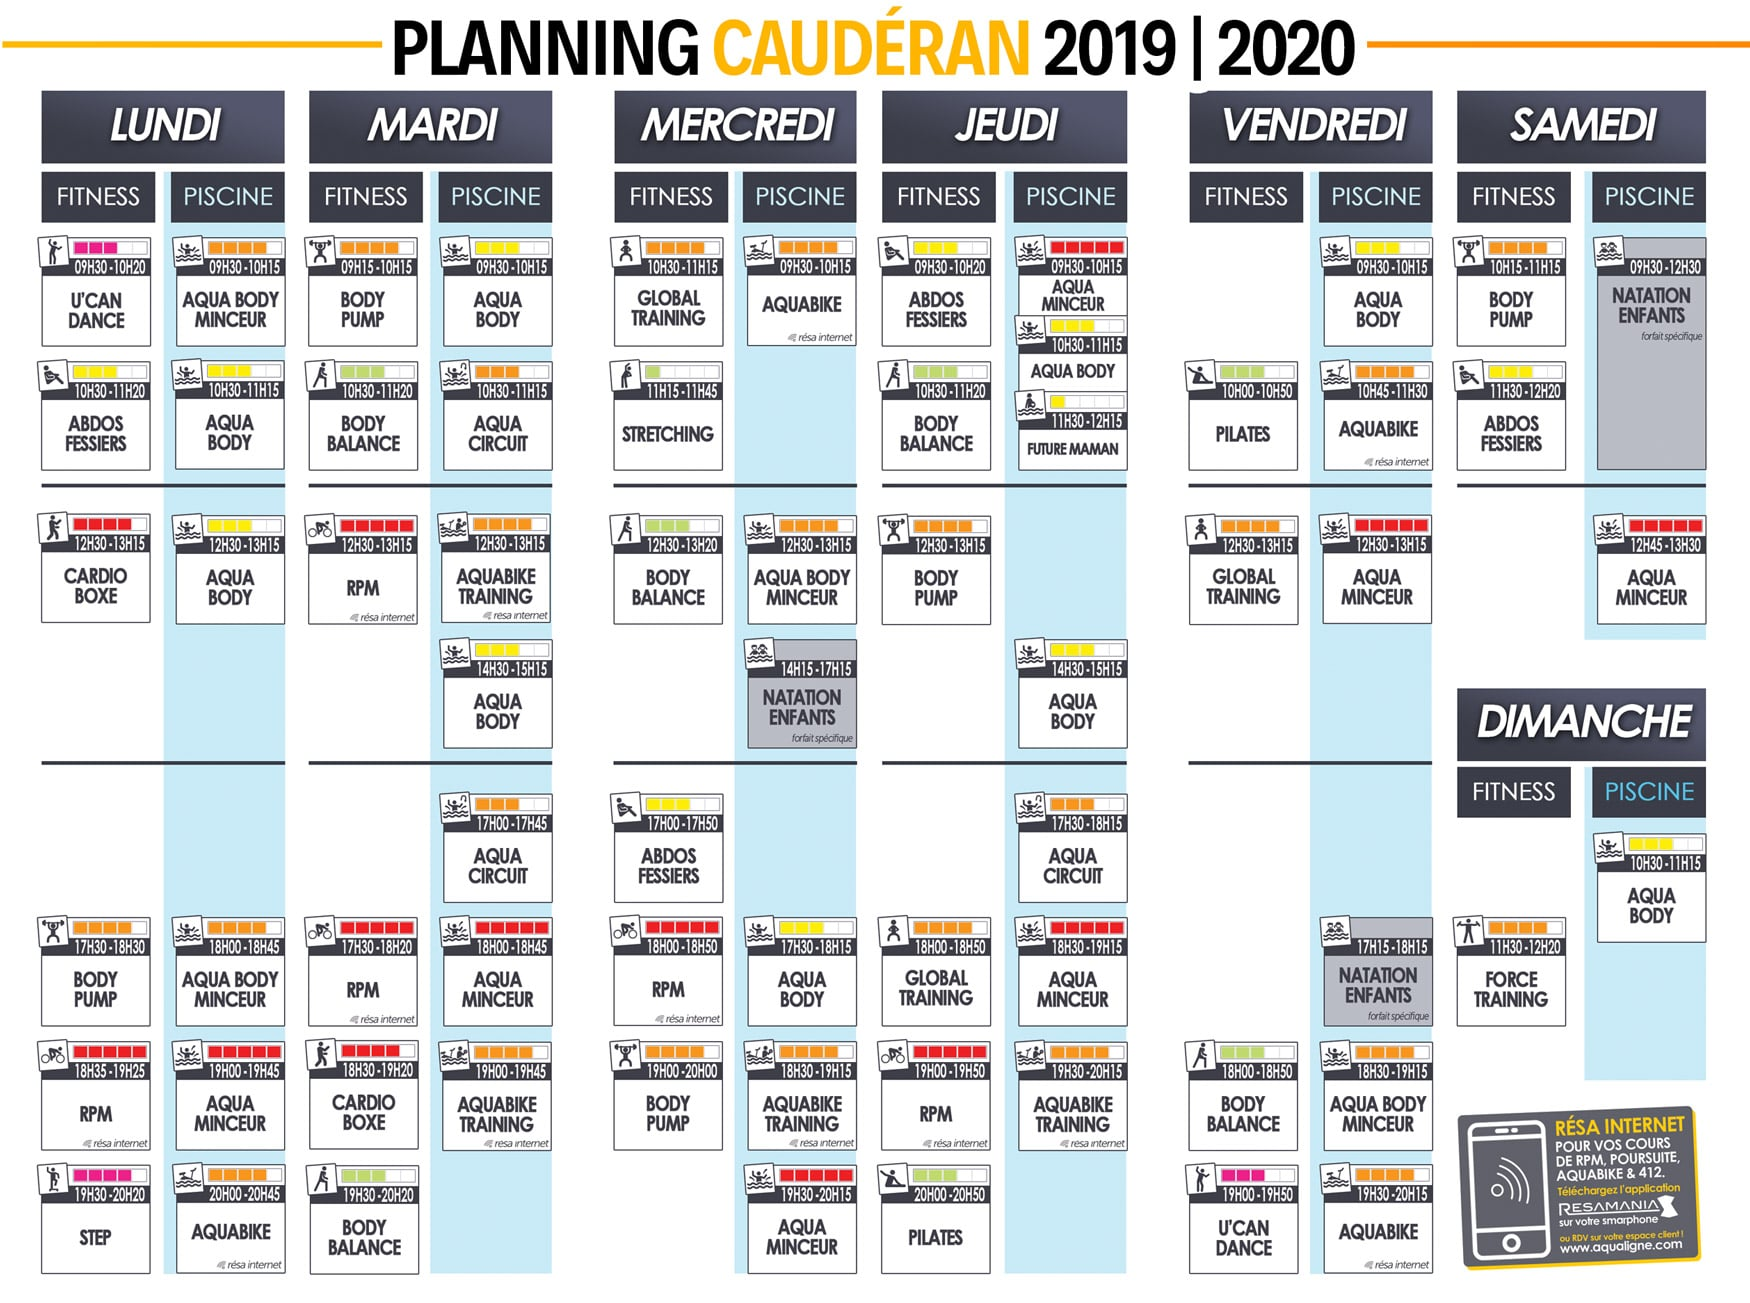 CAUDERAN-Planning-19-20